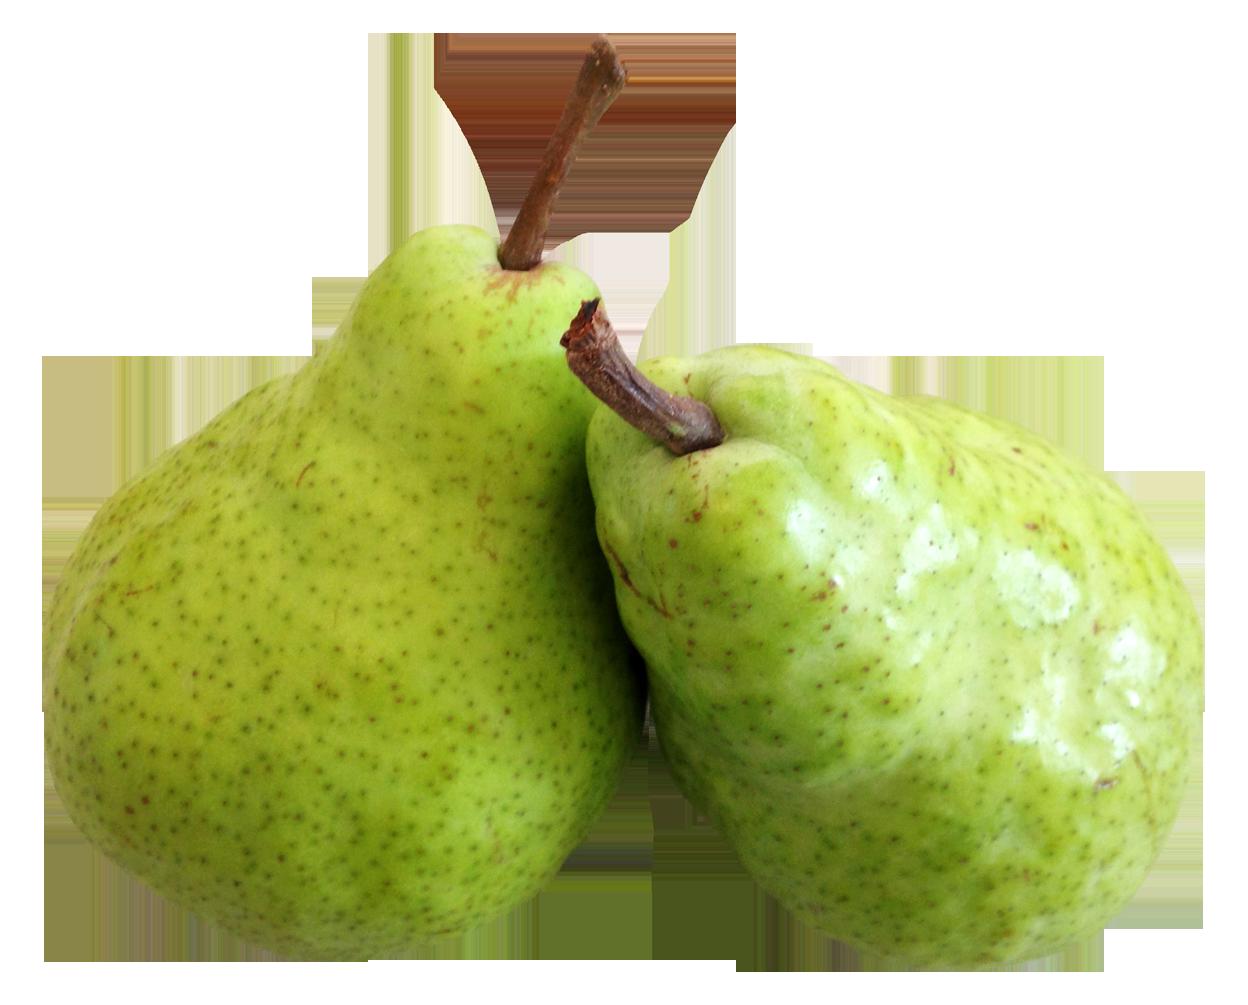 Pear PNG-PlusPNG pluspng.com-1248 - Pear PNG - Pear HD PNG